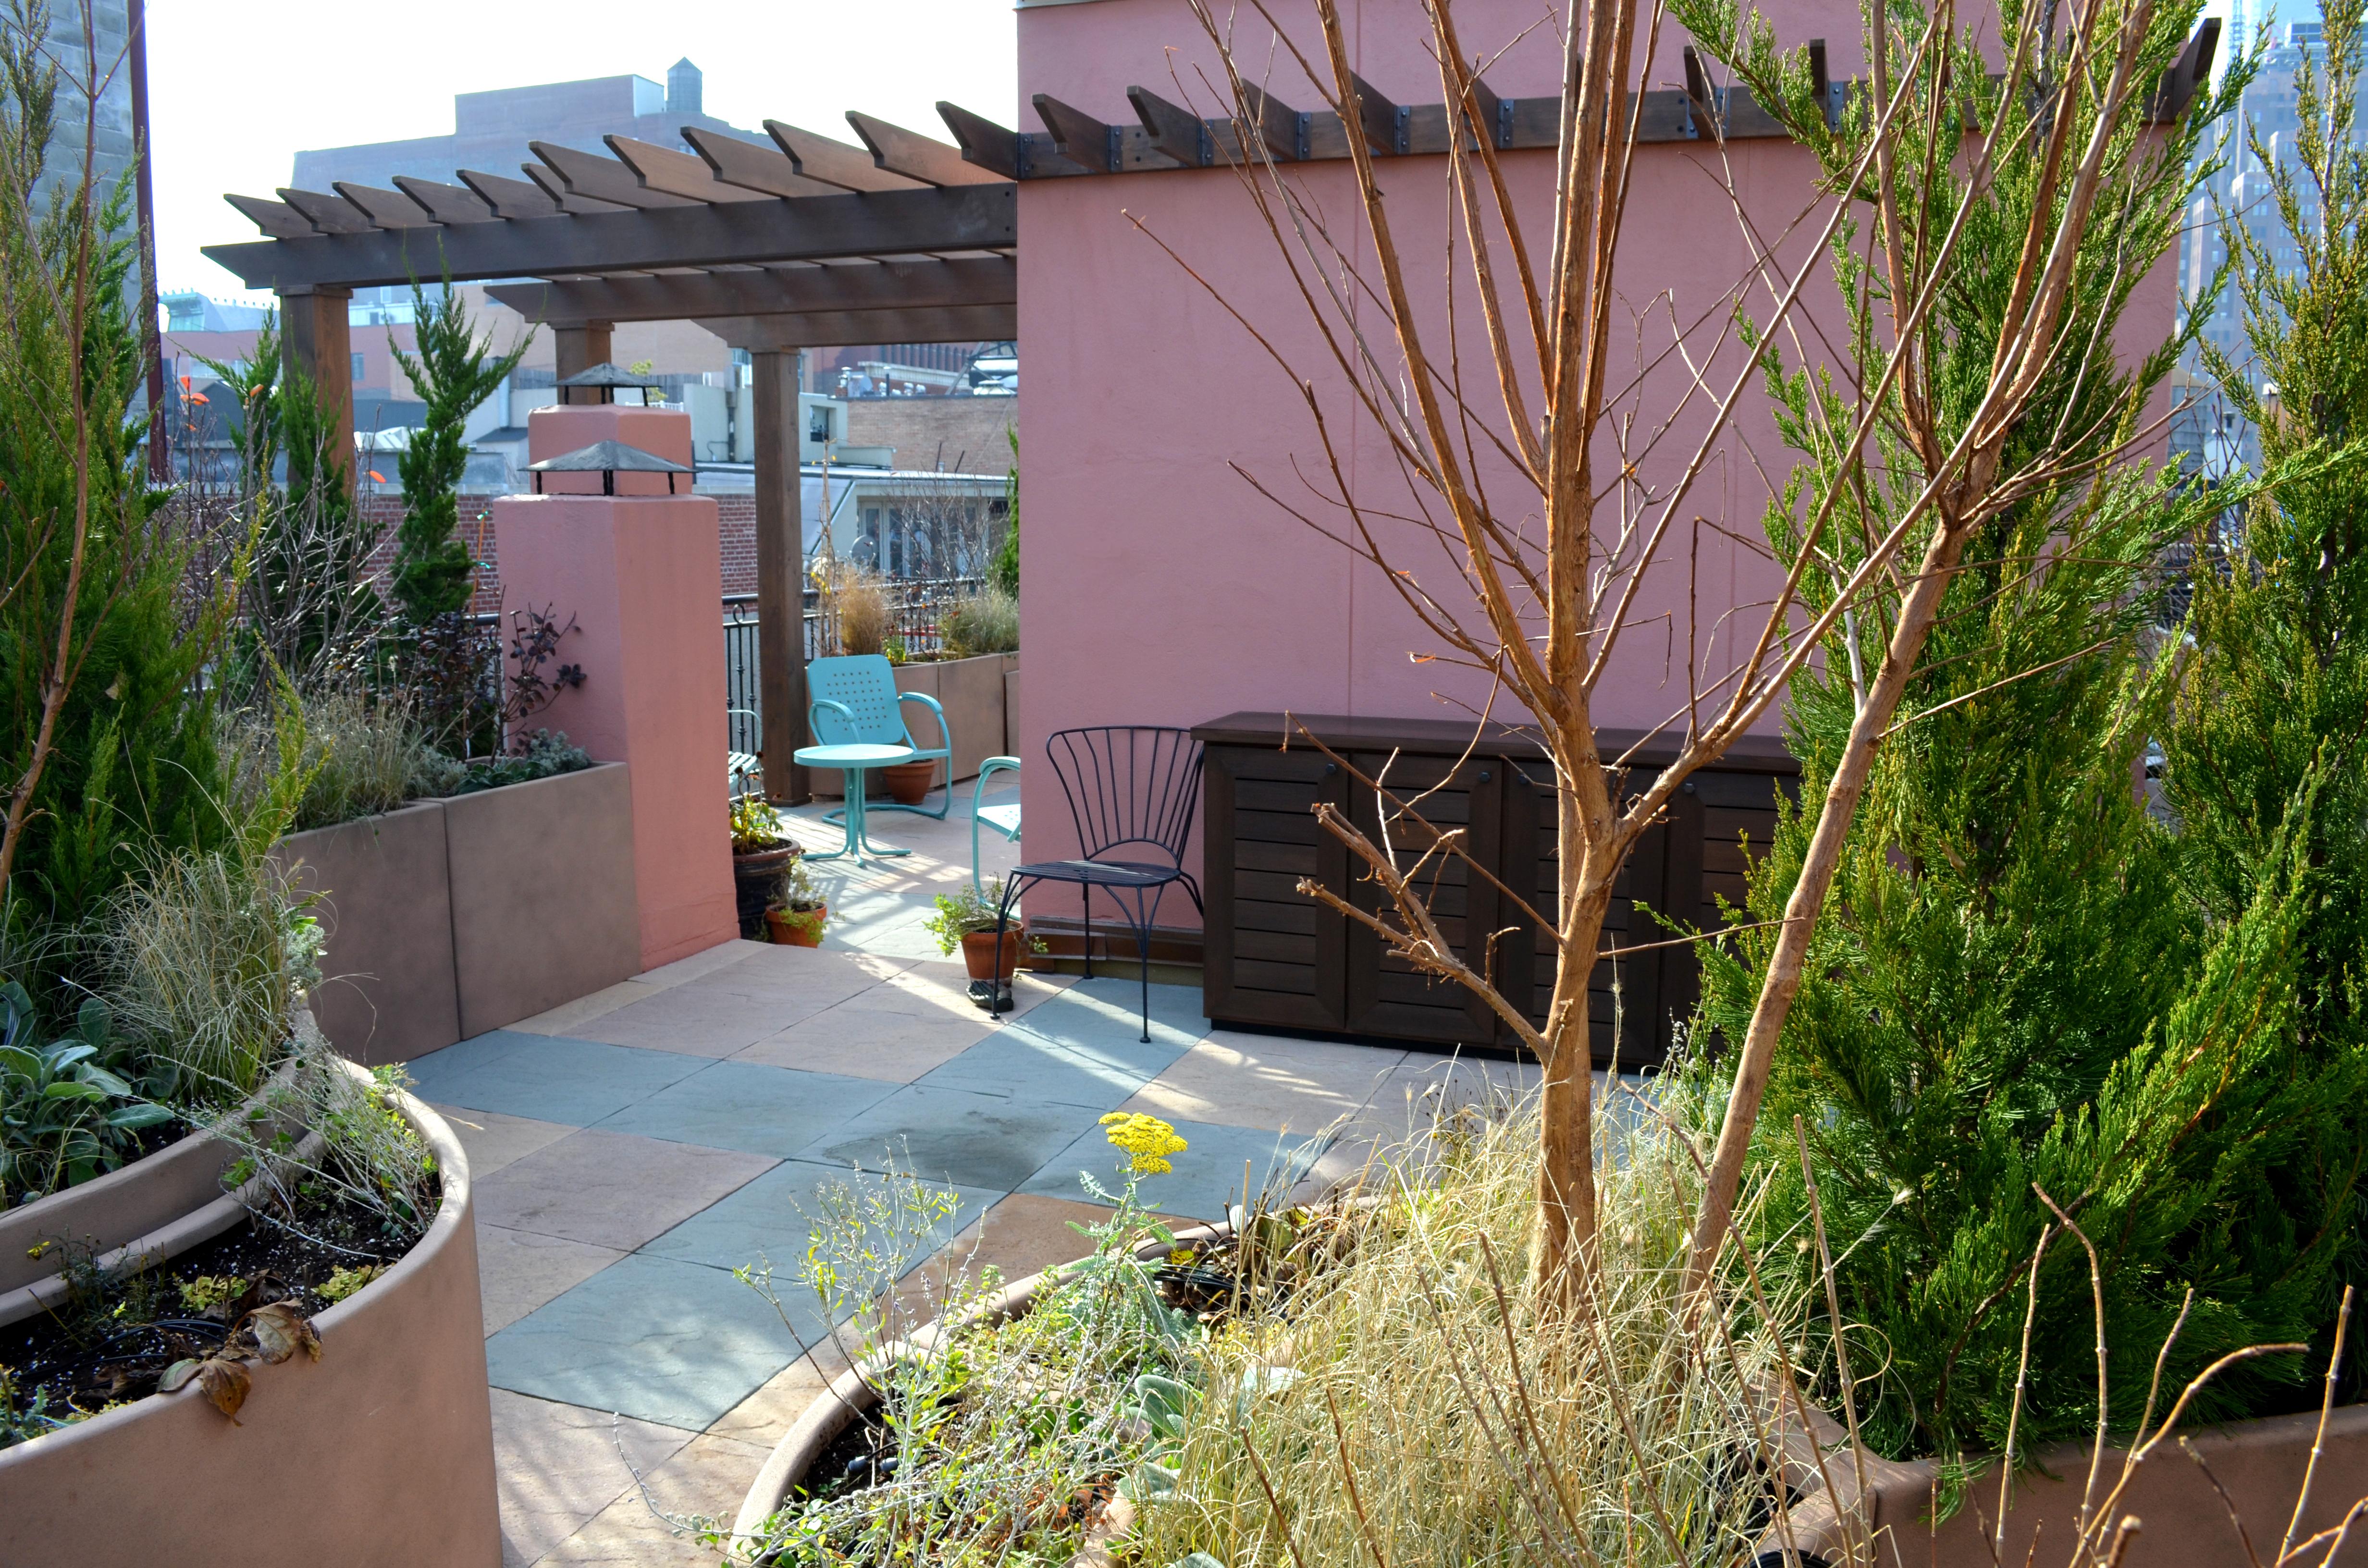 backyard garden nyc erbology